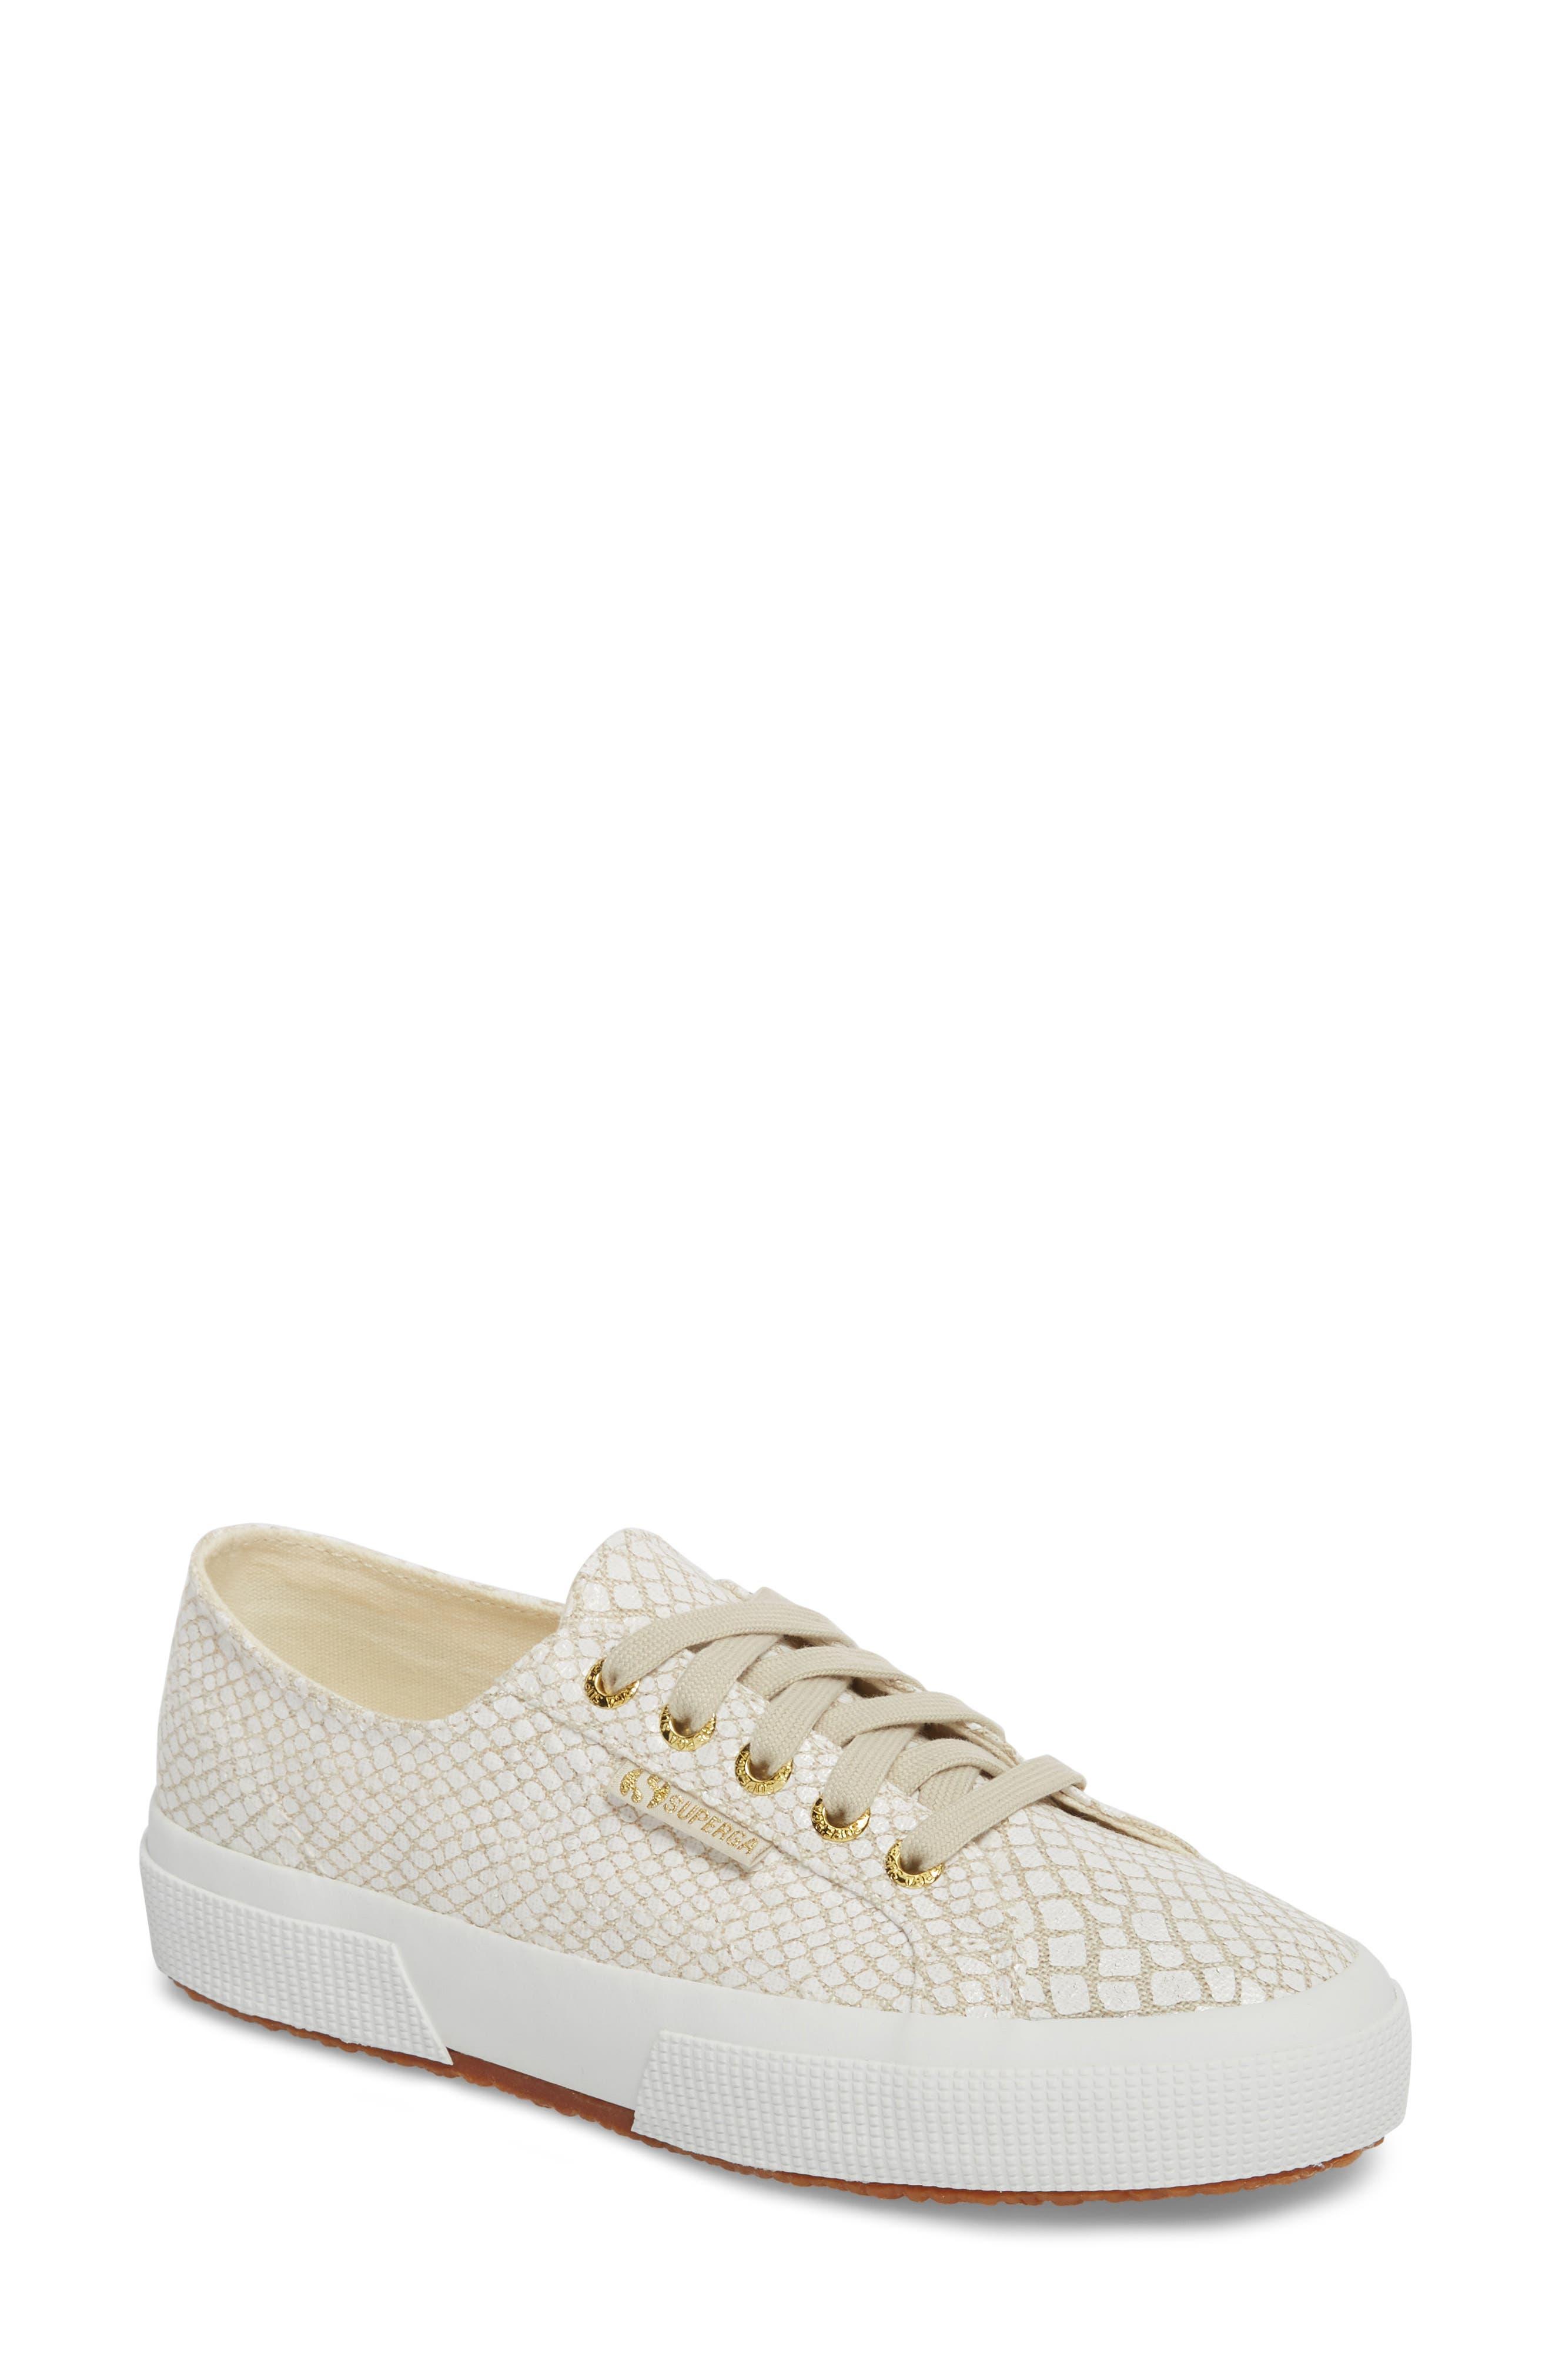 2750 Low Top Sneaker,                         Main,                         color, White Multi